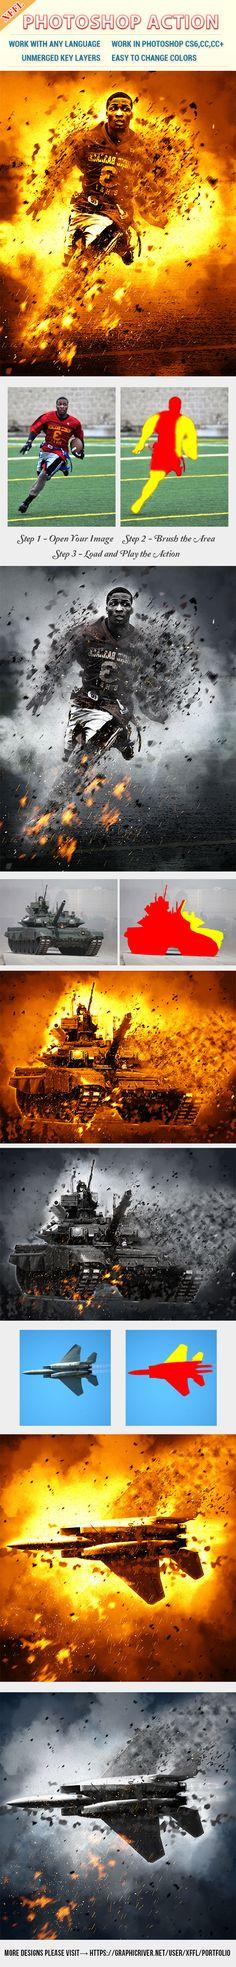 War Blast Scene Photoshop Action — Photoshop ABR #design #fragment • Available here → https://graphicriver.net/item/war-blast-scene-photoshop-action/19800177?ref=pxcr